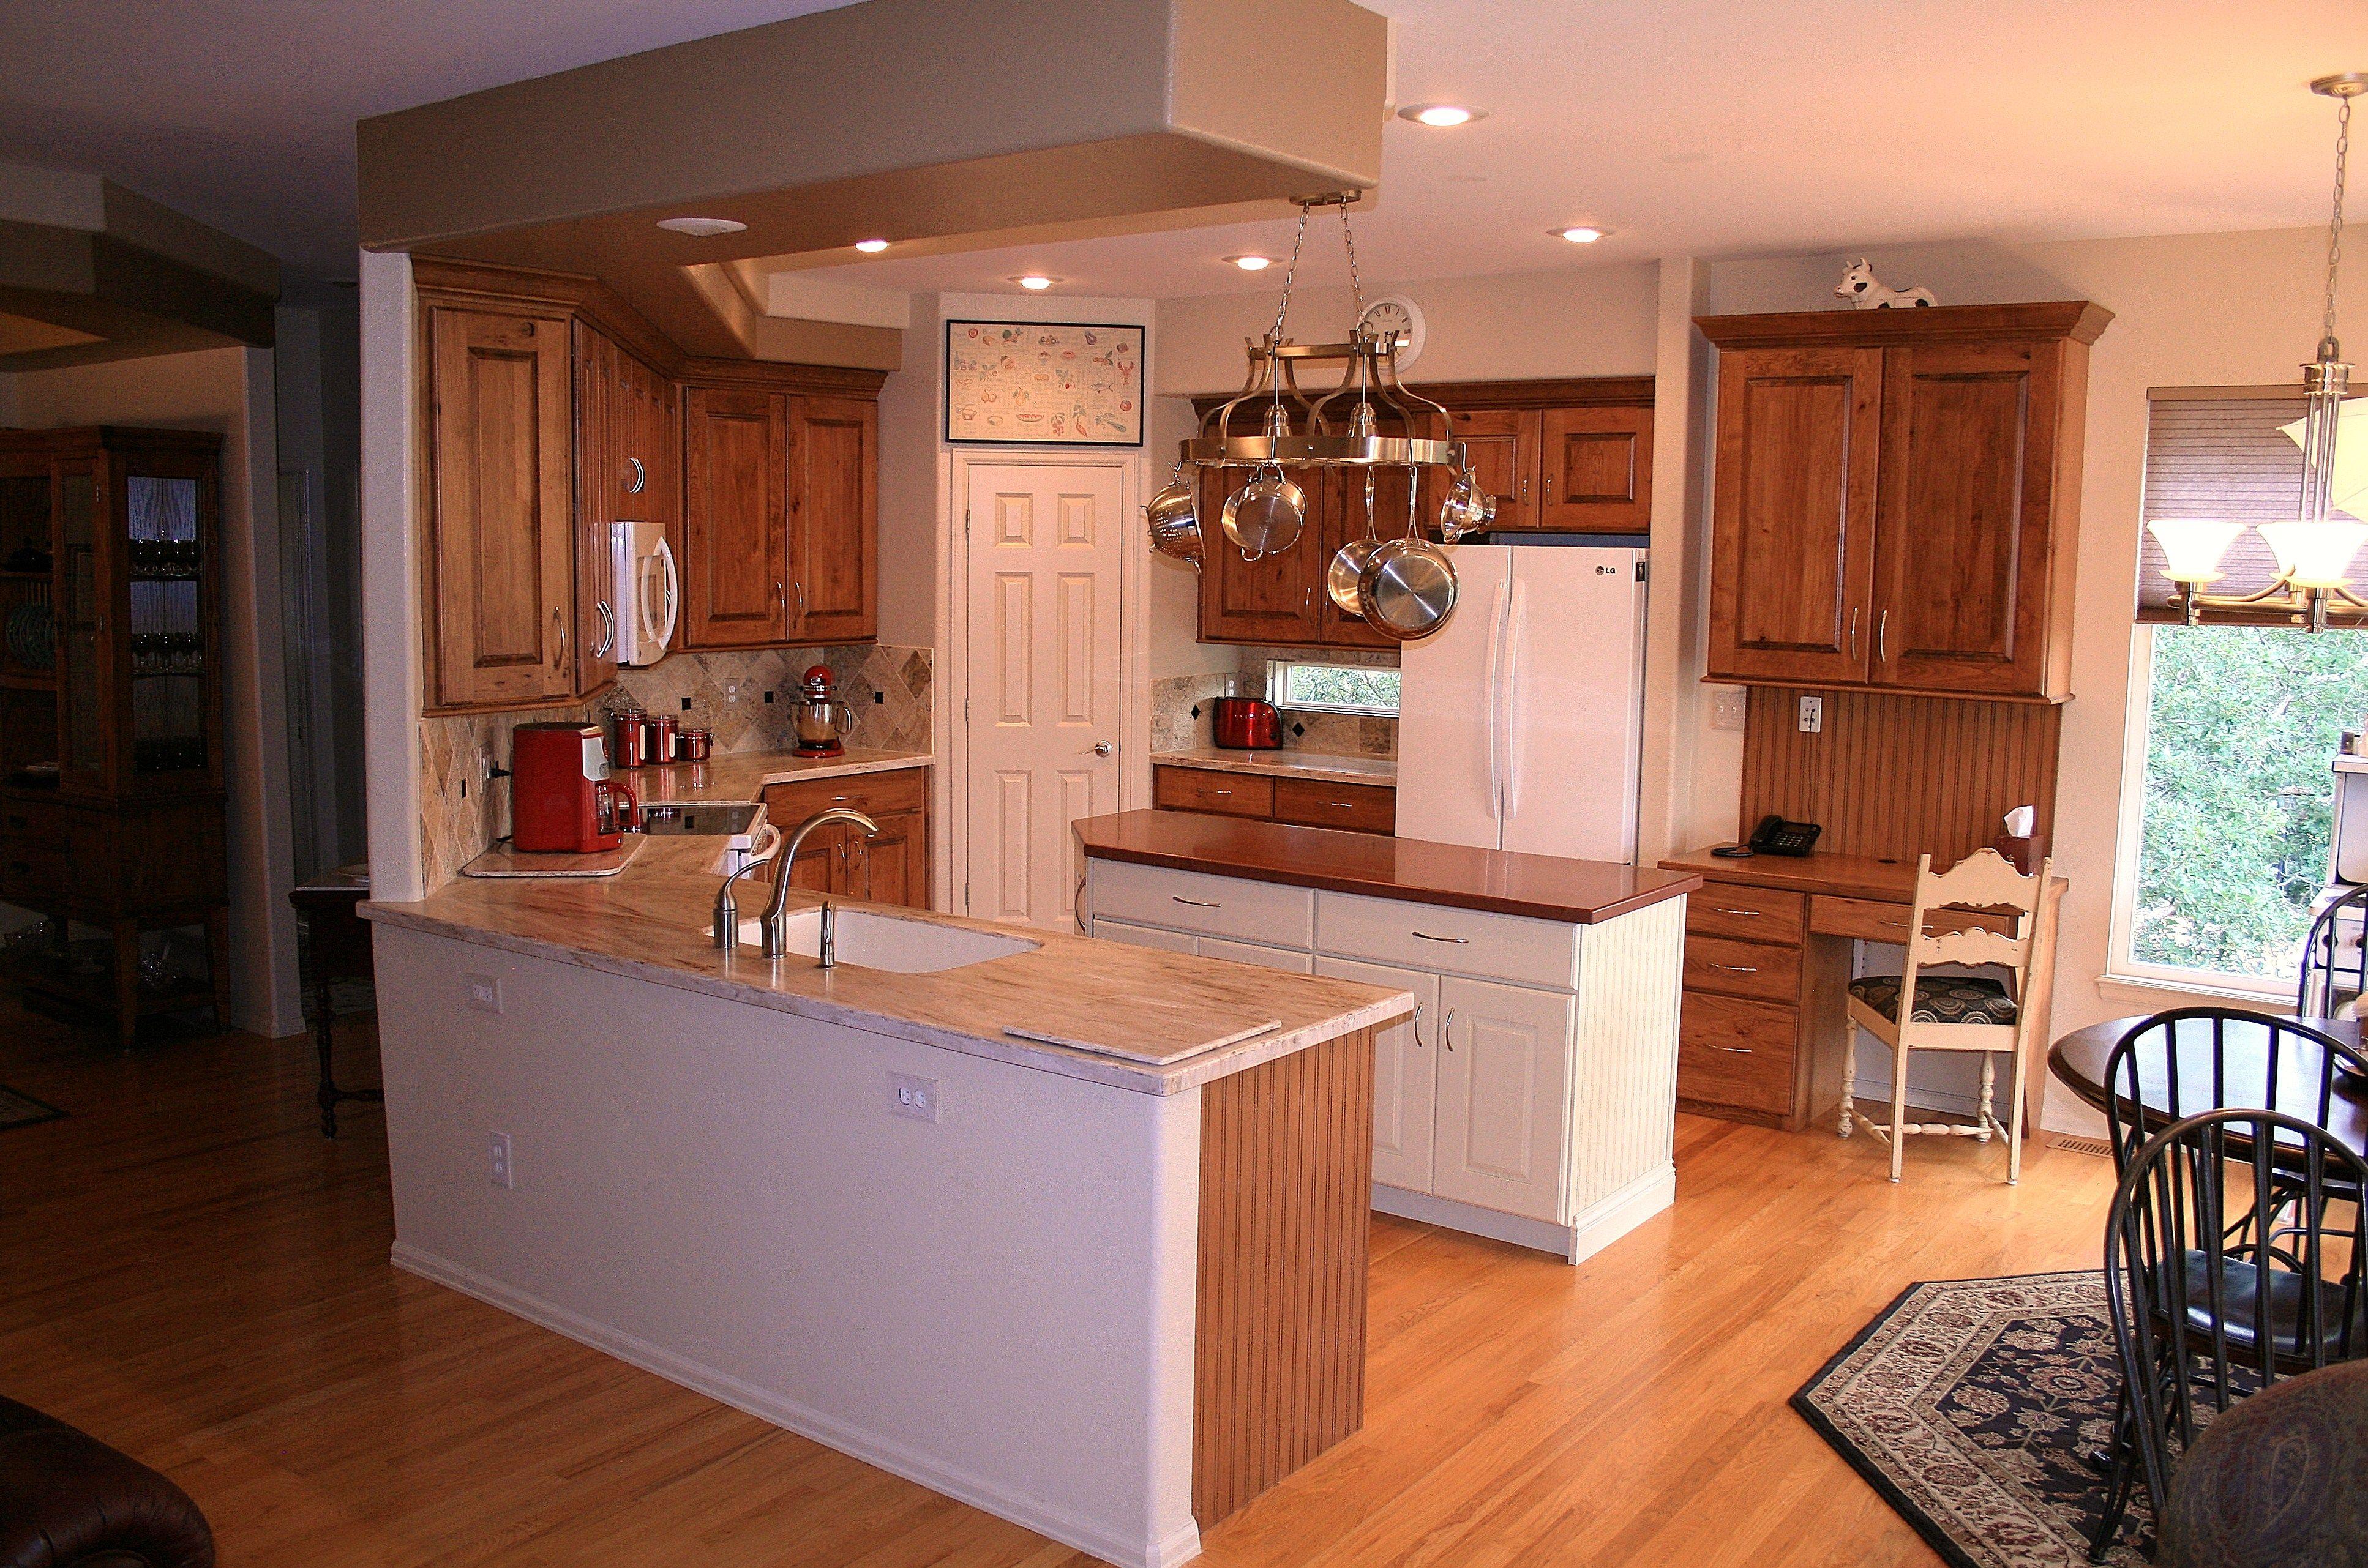 UShaped kitchen with Island in Middle Kitchen, U shaped